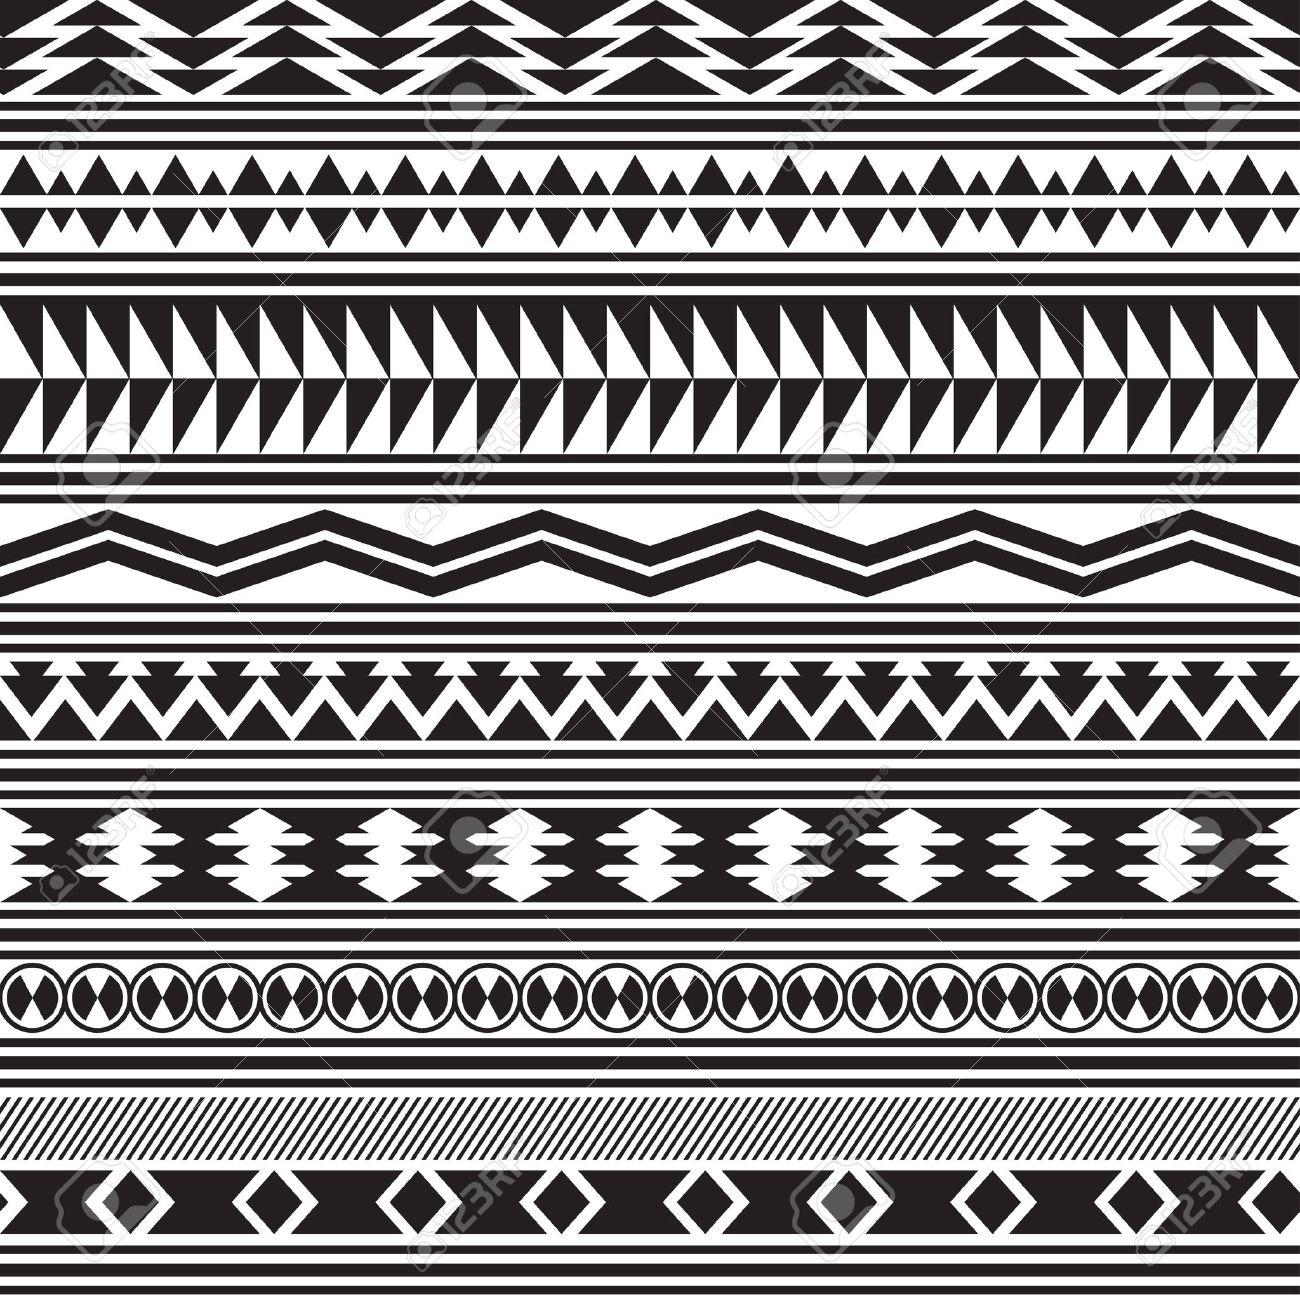 tribal striped seamless pattern geometric black-white background